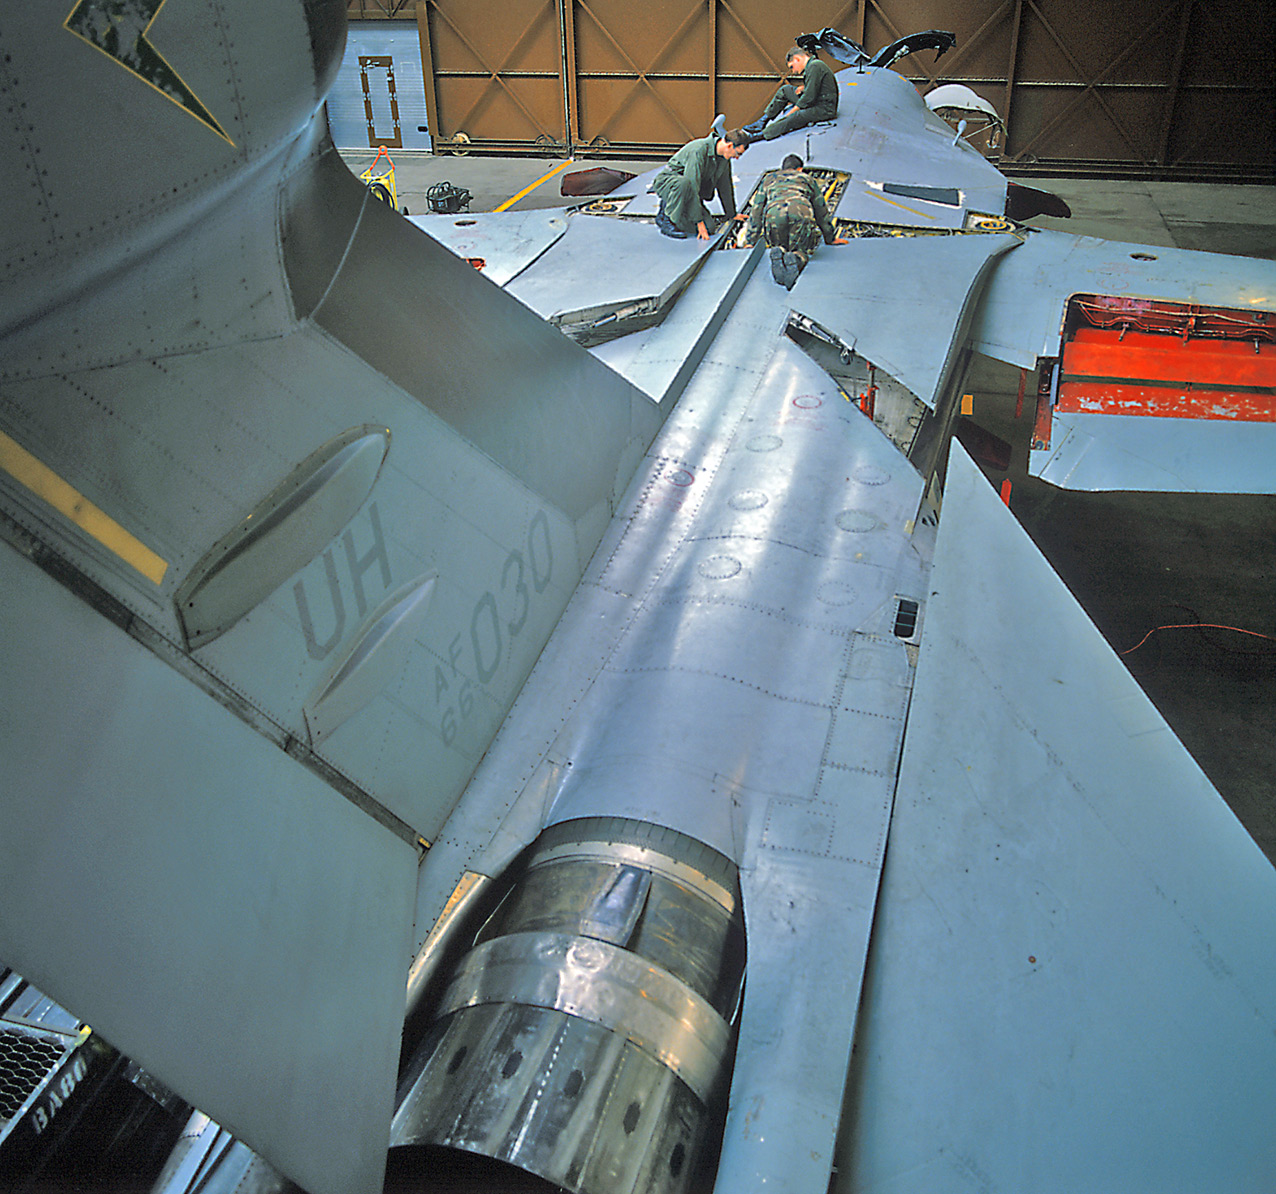 A 42nd ECS EF-111A at the Upper Heyford Phase workshops, 1990